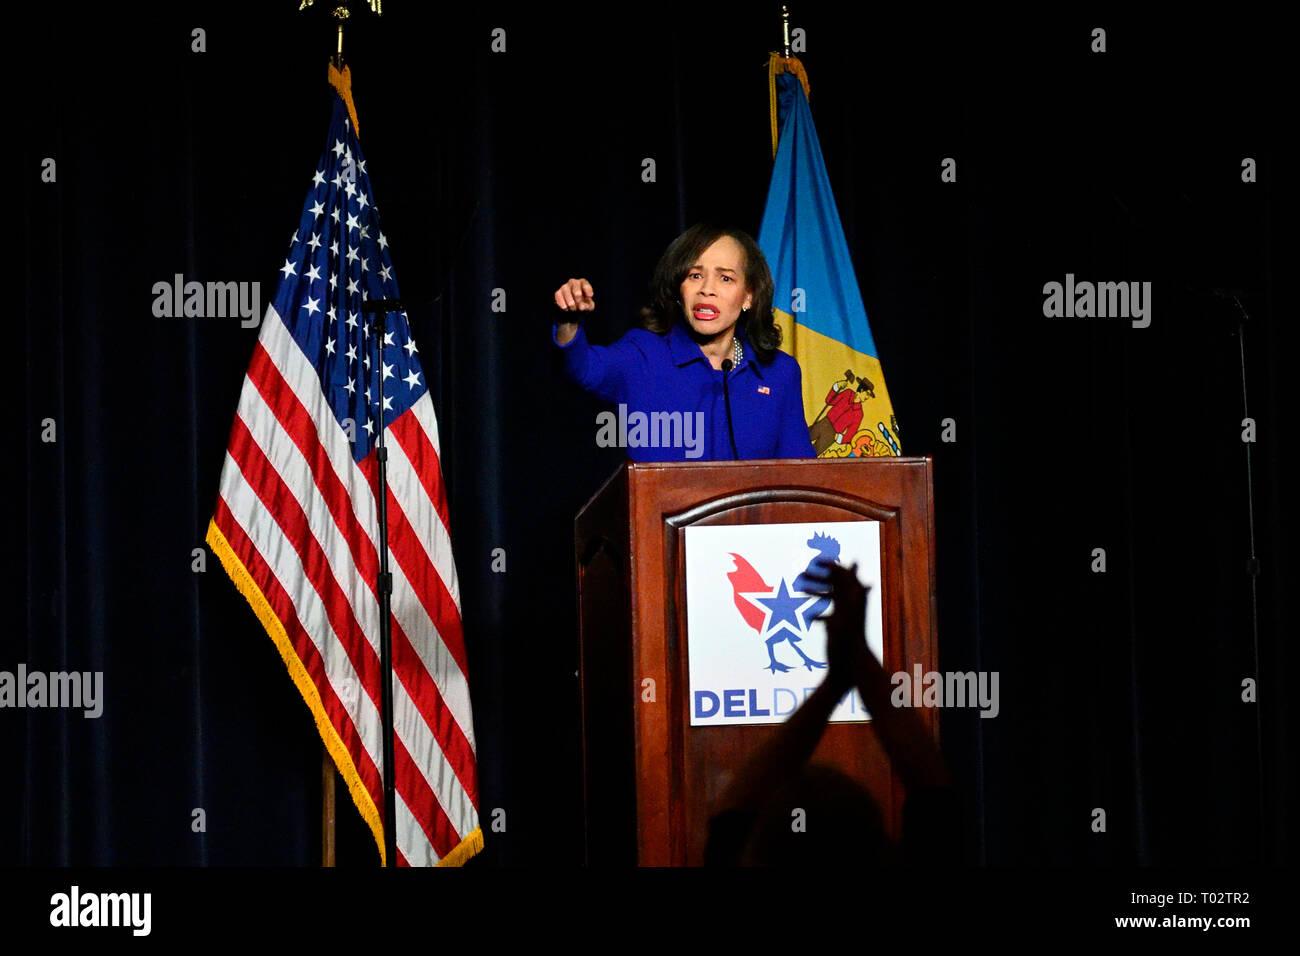 Delaware, USA  16th March 2019  Congresswoman Lisa Blunt